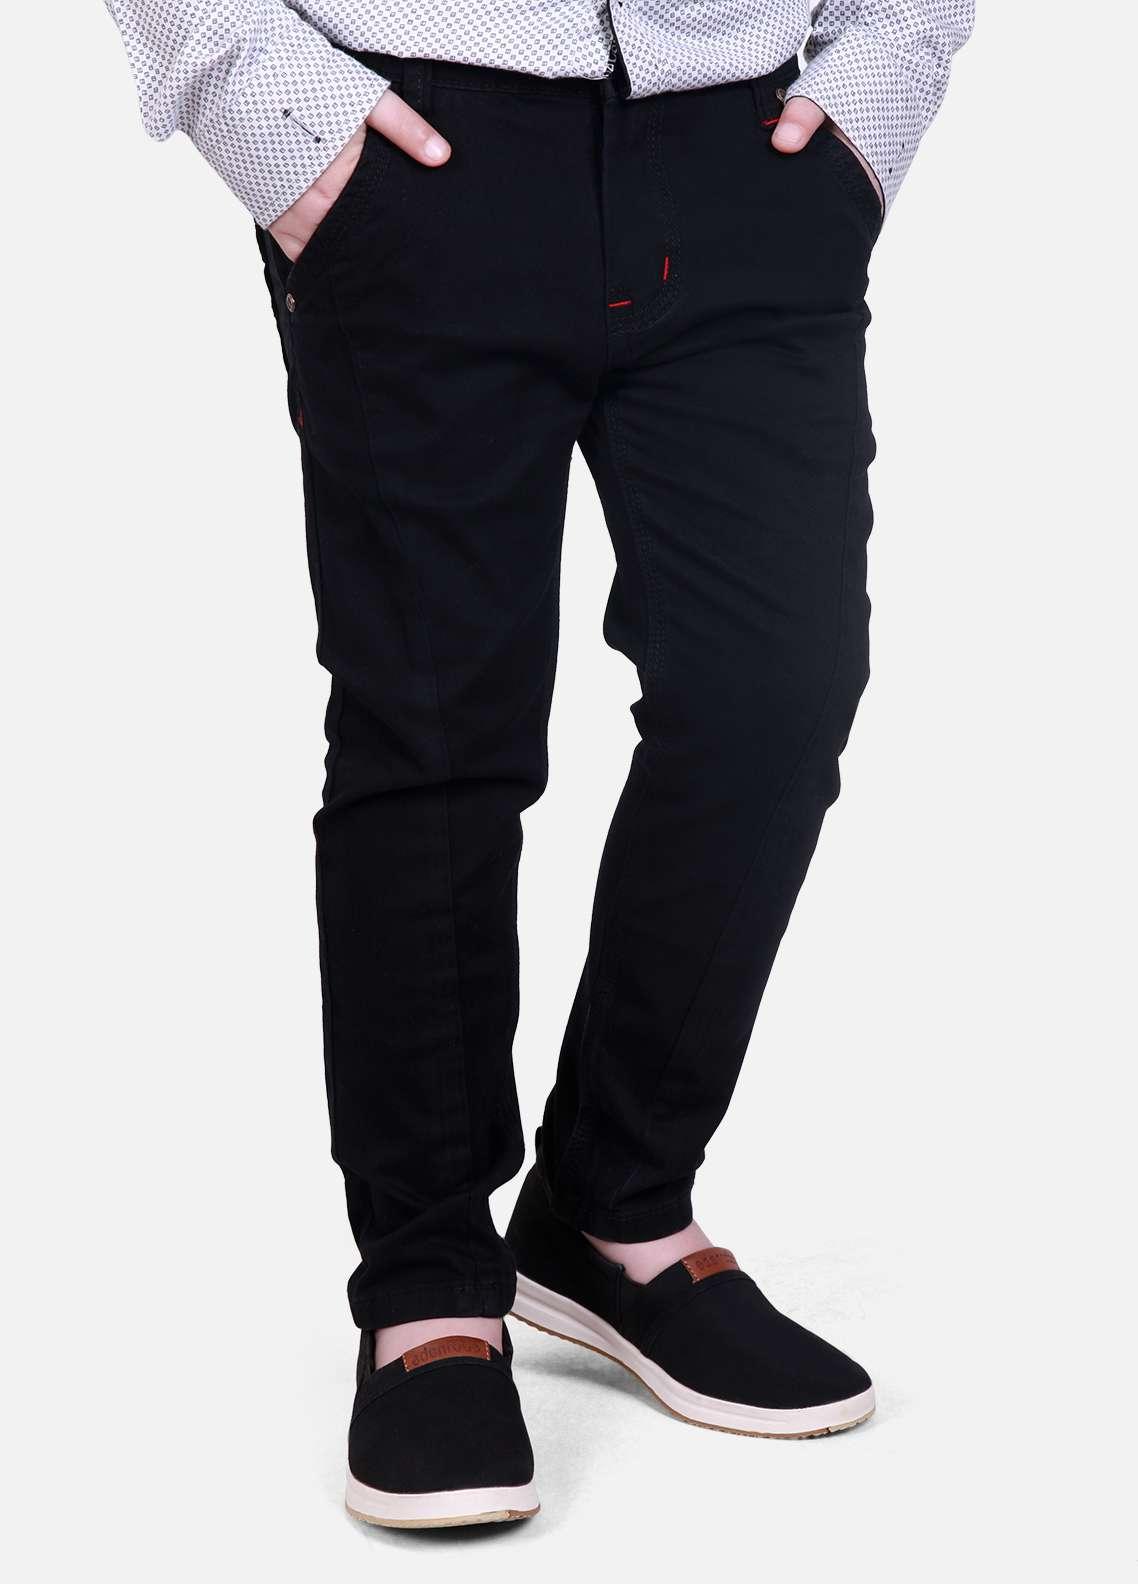 Edenrobe Cotton Plain Texture Pants for Boys - Black EDK18P 24053